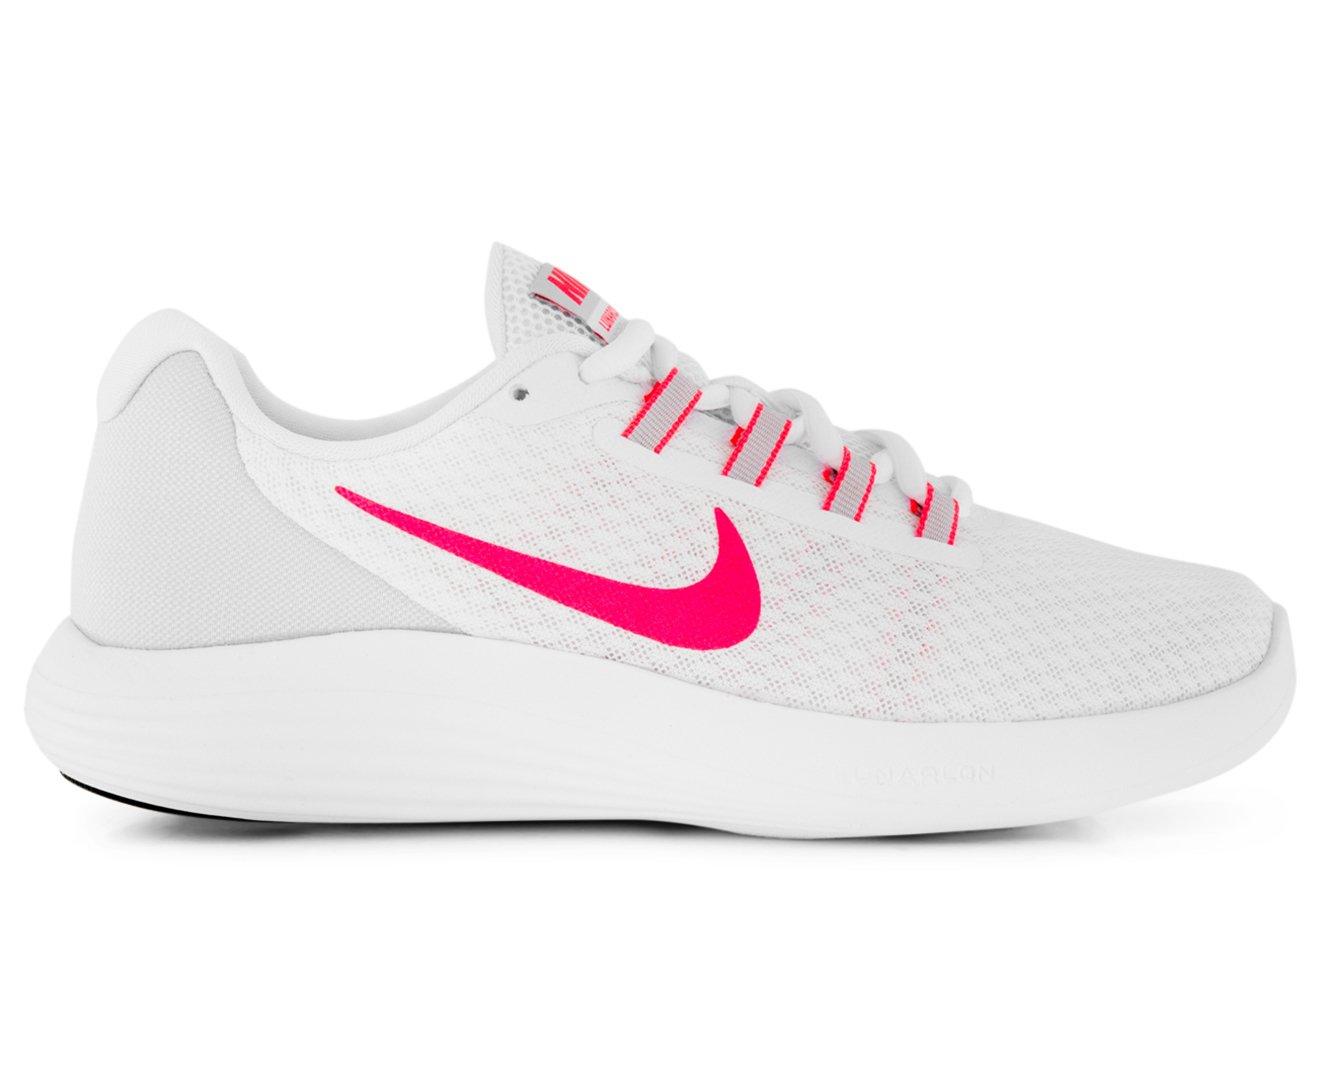 NIKE Womens Lunarconverge Lunarlon Fitness Running Shoes B000OB45UQ 10 M US|White Racer/Pink